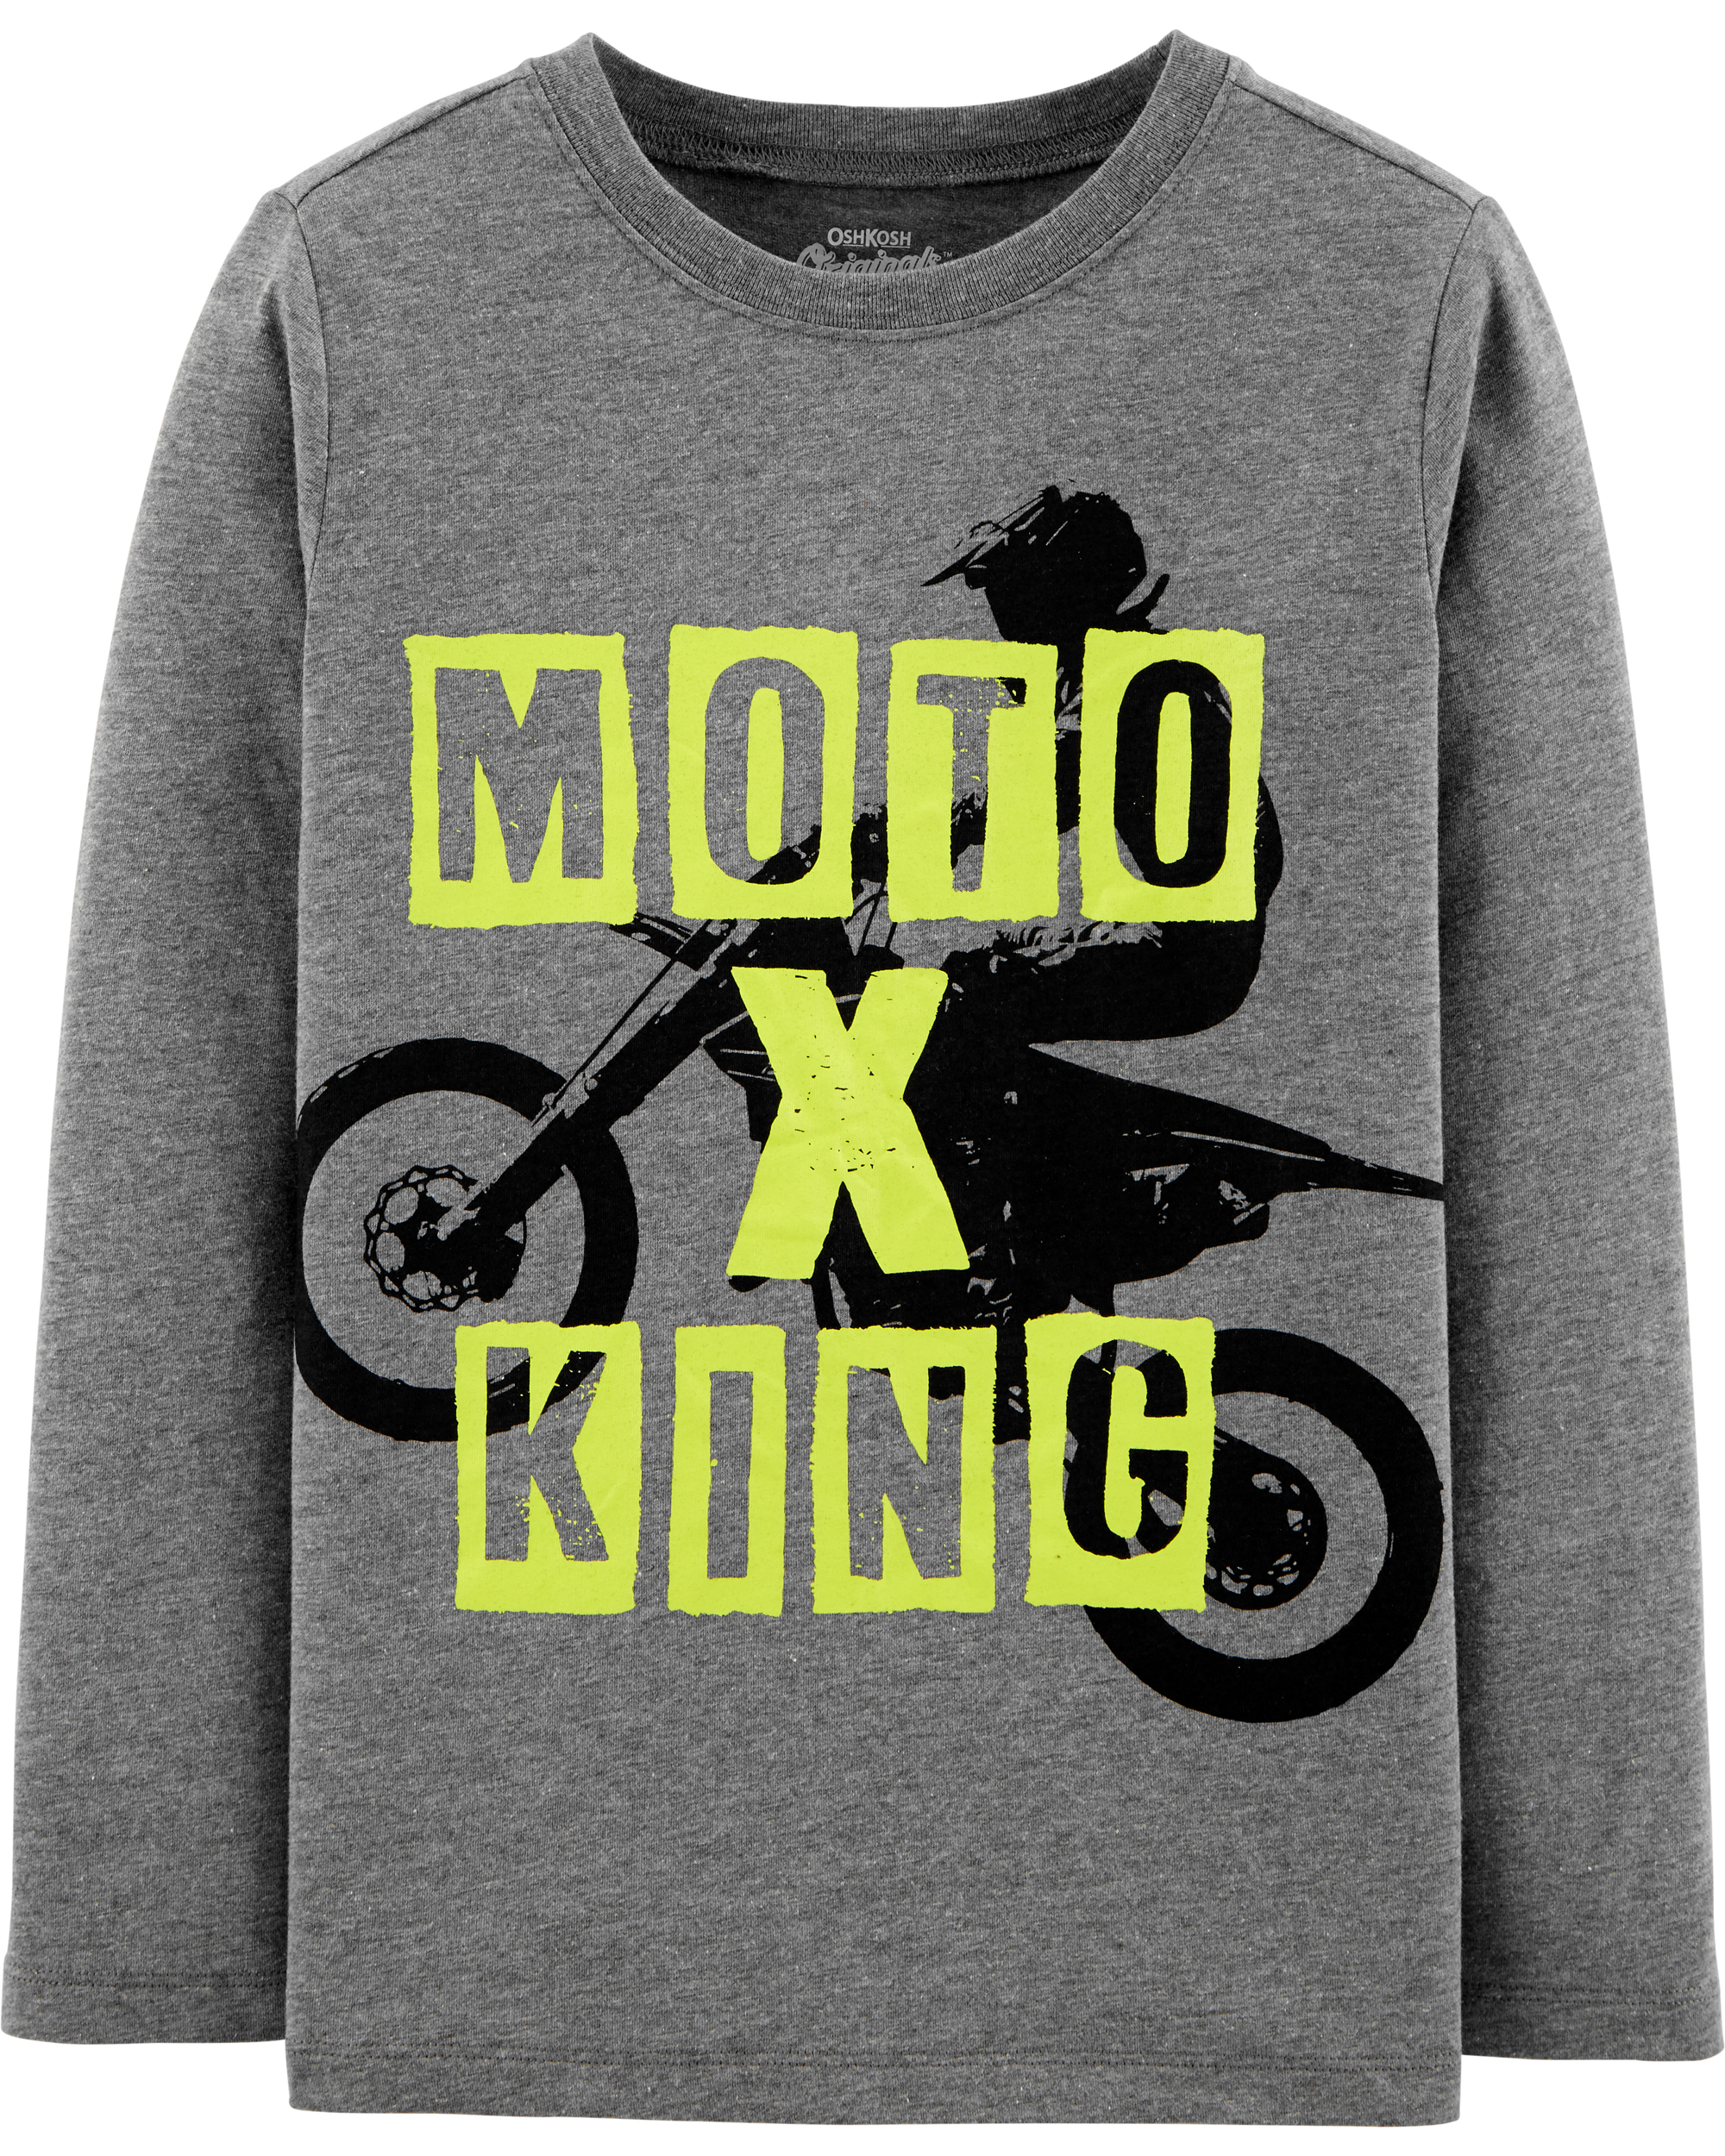 MOTO KING חולצת